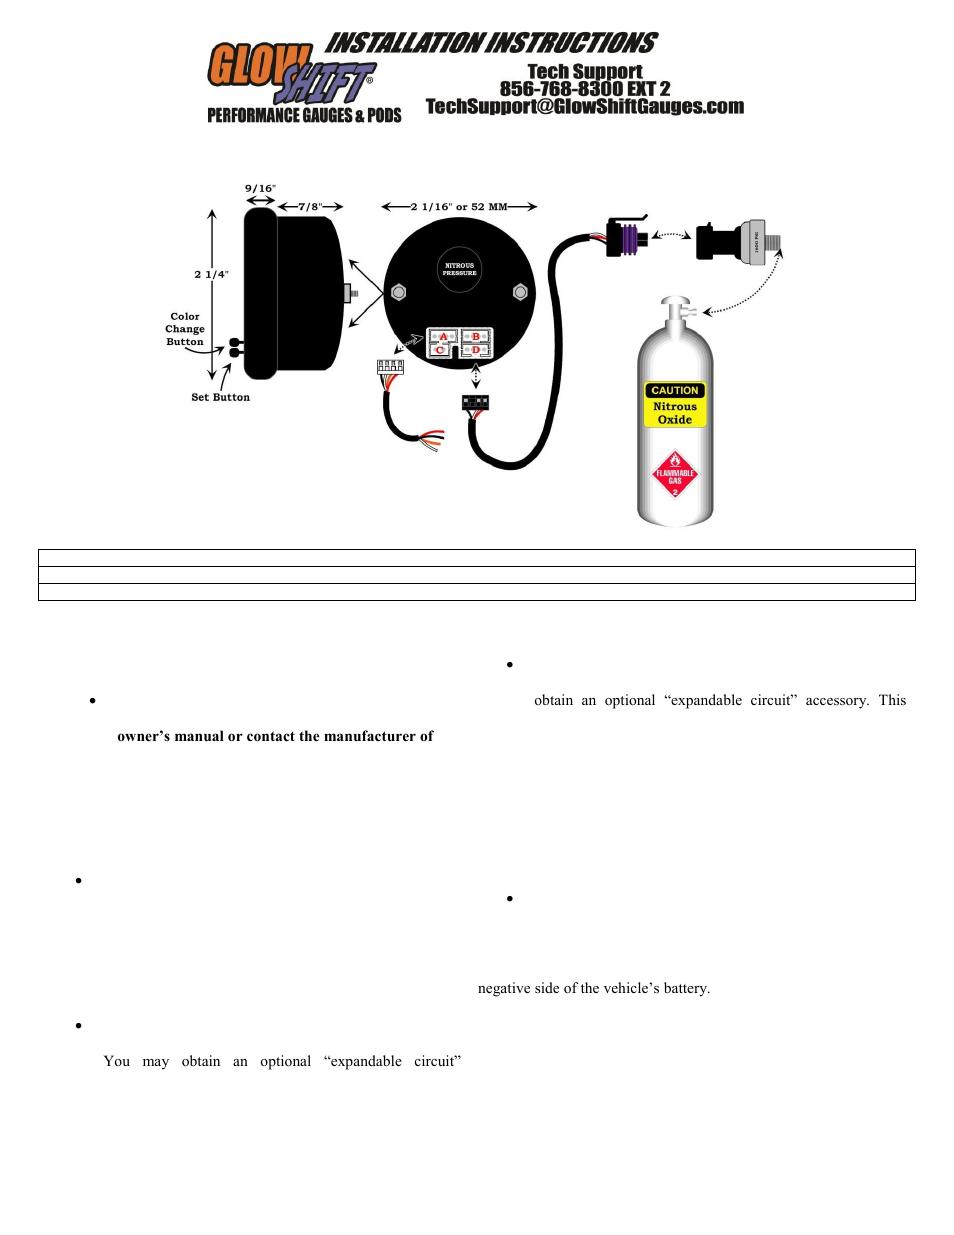 pressure sensor wiring diagram glowshift nitrous pressure gauge user manual 3 pages unik 5000 pressure sensor wiring diagram glowshift nitrous pressure gauge user